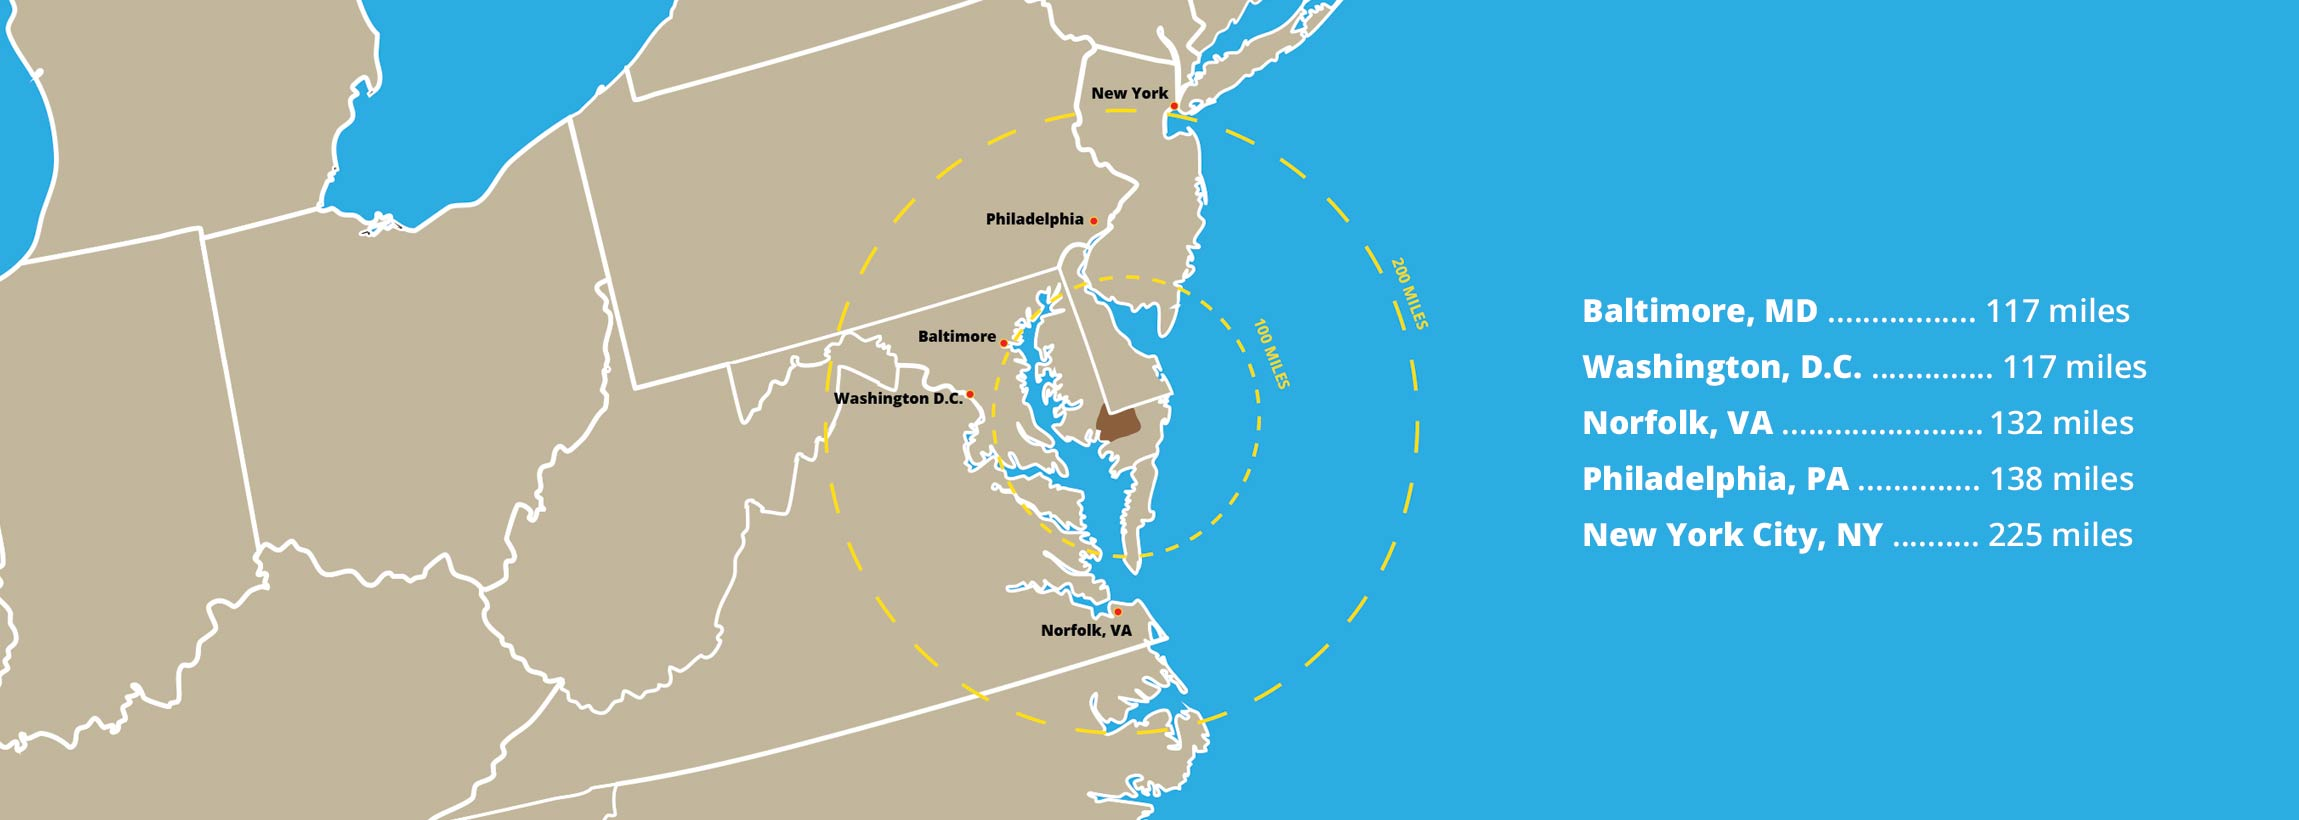 Wicomico County Maryland location on the East Coast